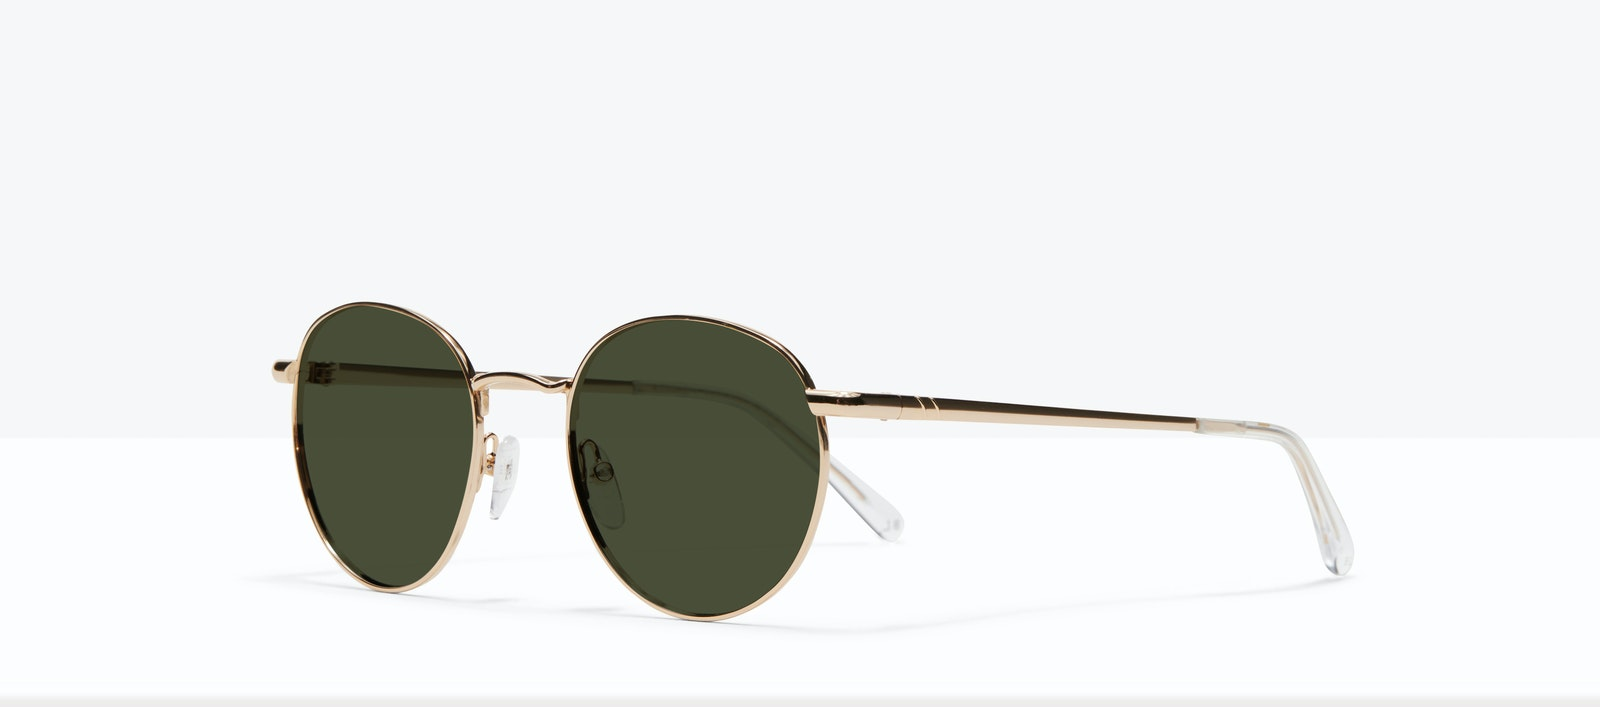 Affordable Fashion Glasses Round Sunglasses Men Women Dynasty M Gold Tilt